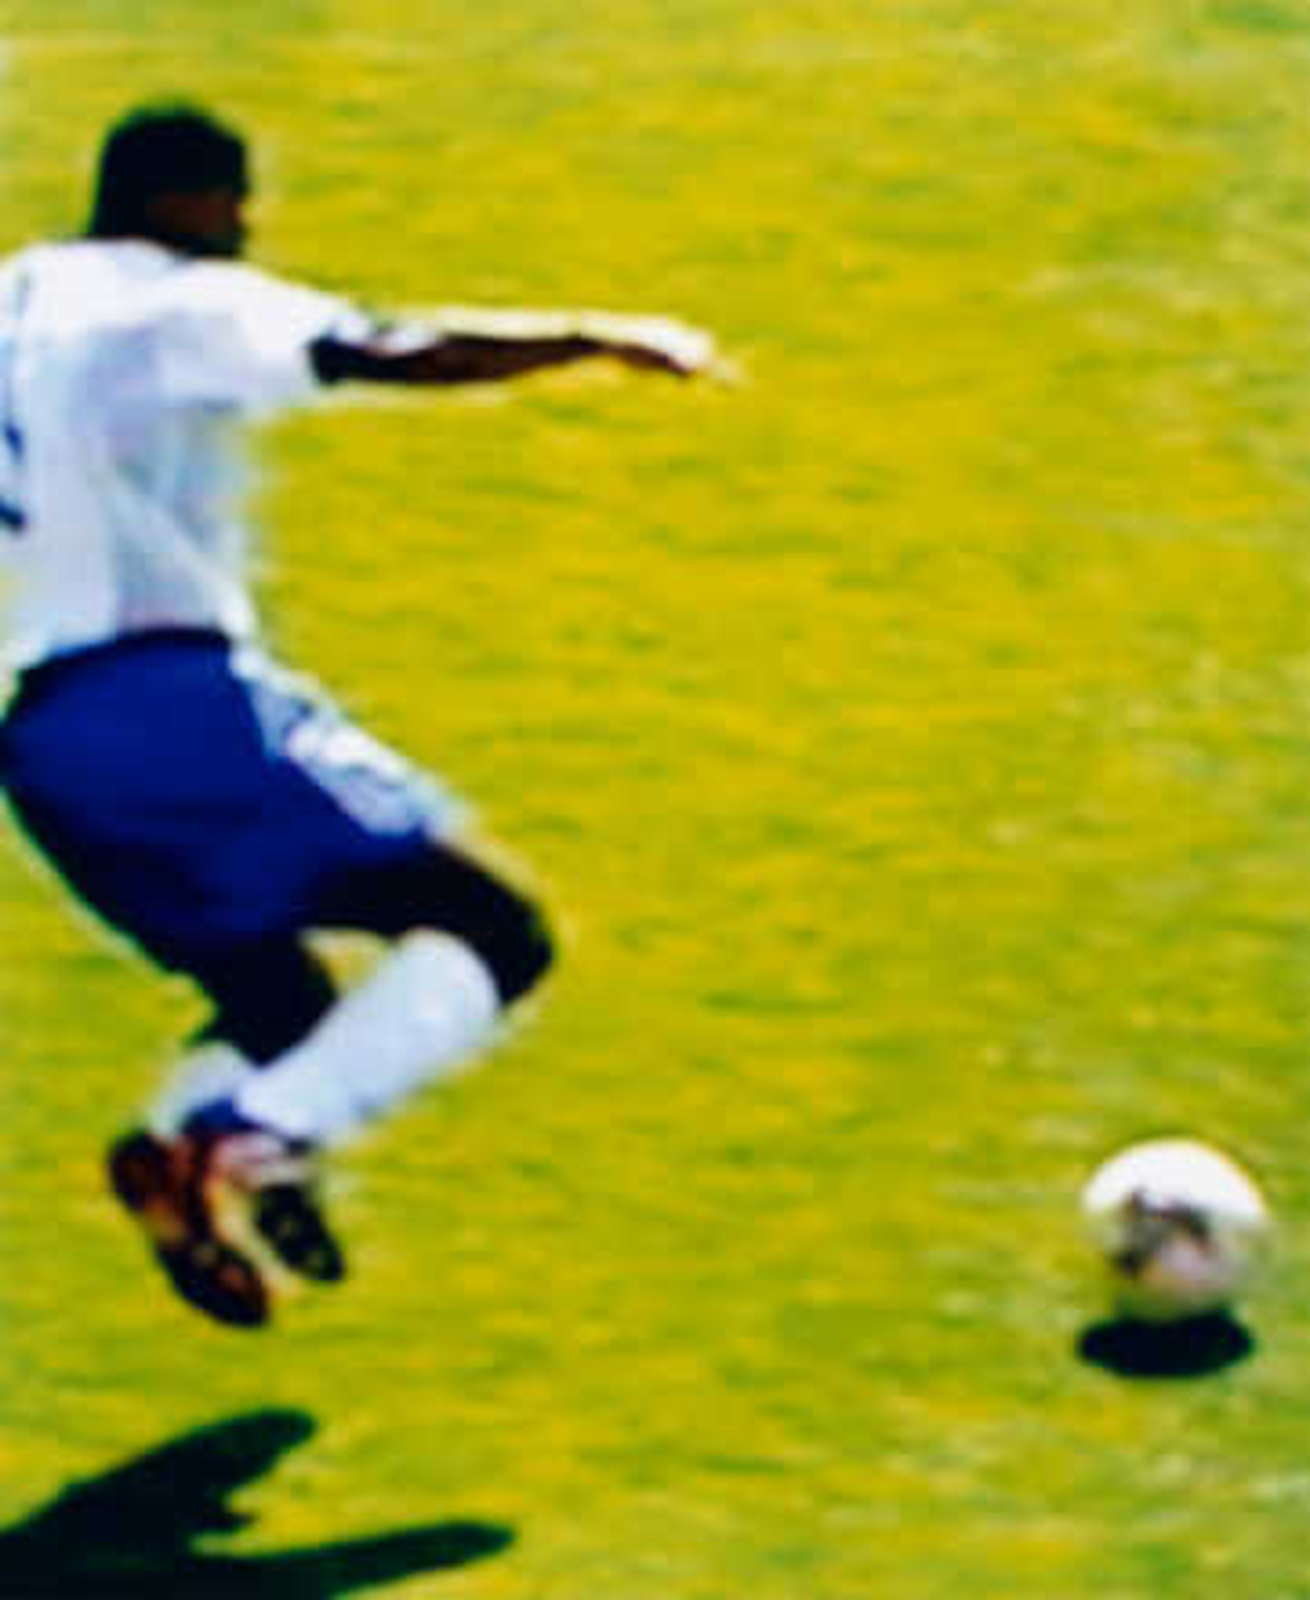 Marcel Desailly France v Denmark 0 - 2 (Group Stage) 11.06.2002, Incheon Munhak Stadium, Incheon, South Korea - Robert Davies